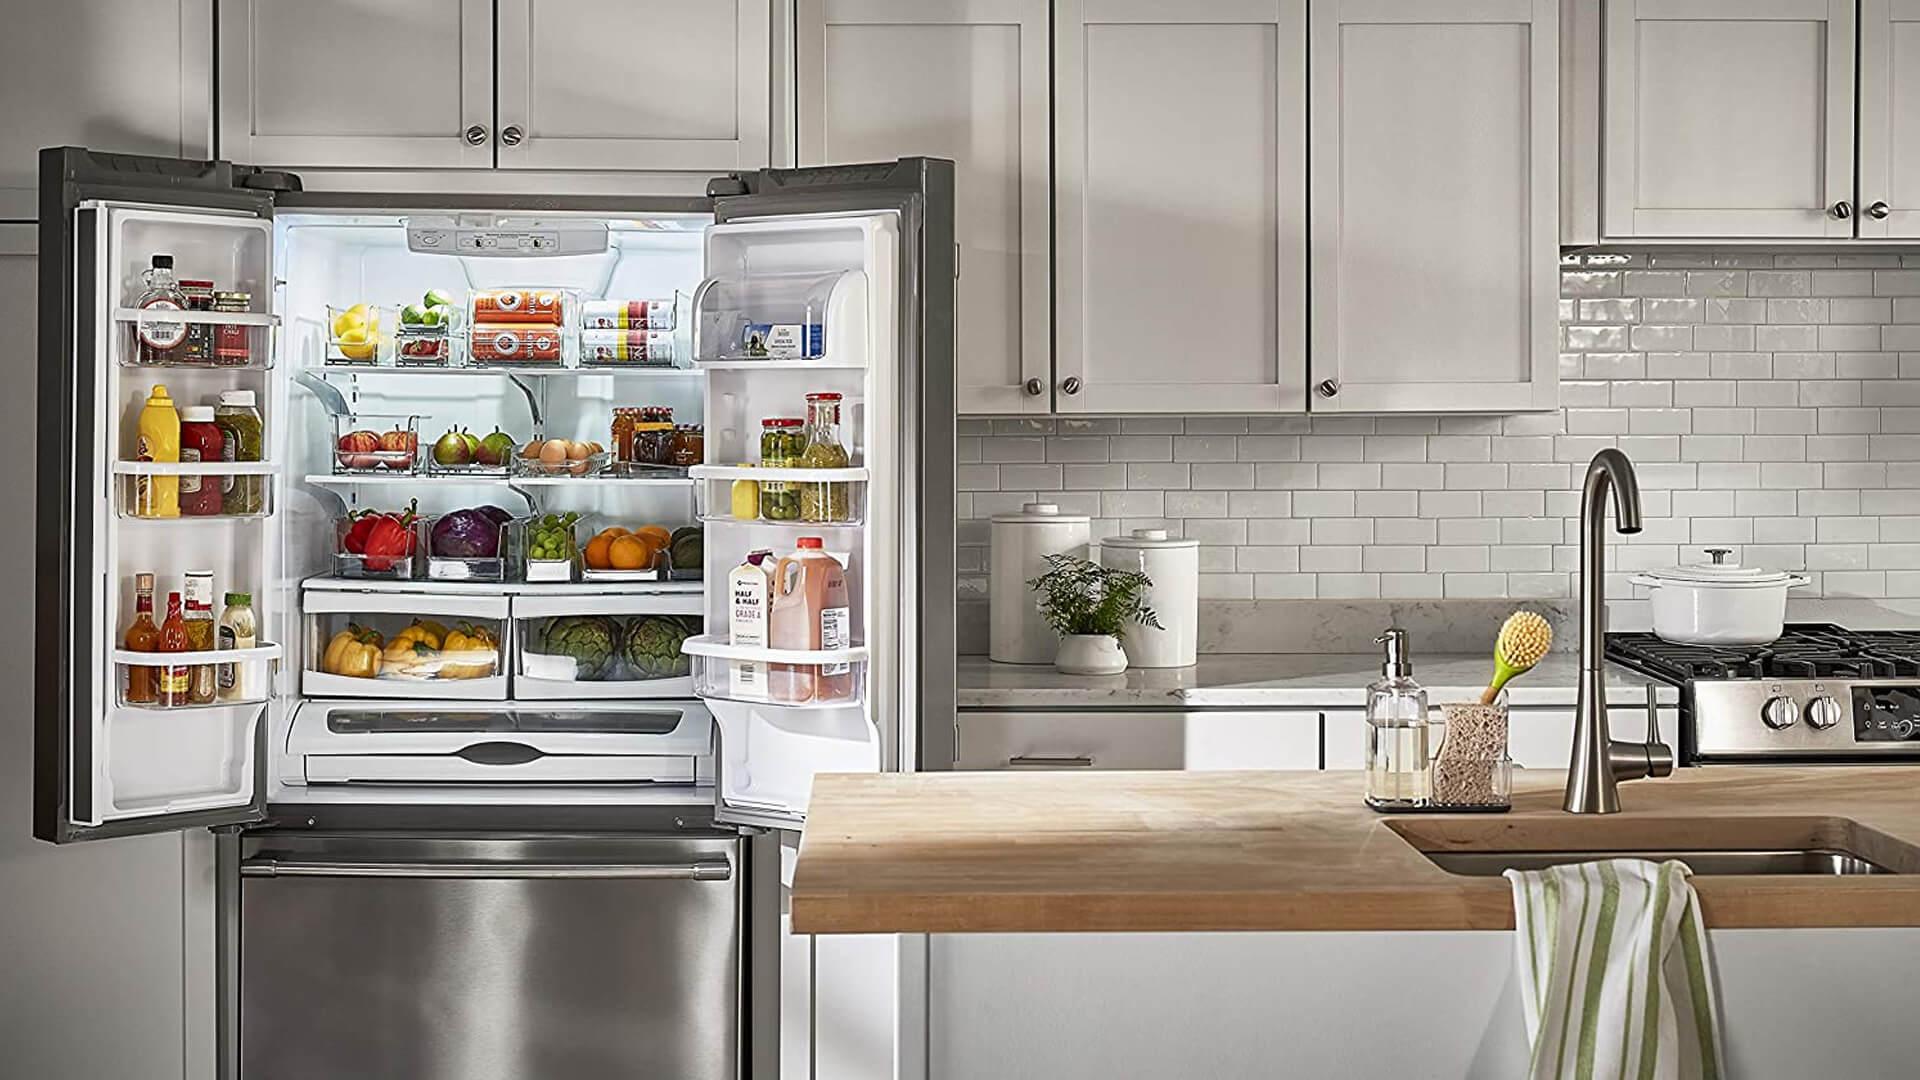 Thermador Bottom Freezer Refrigerator Repair   Thermador Appliance Repair Pros